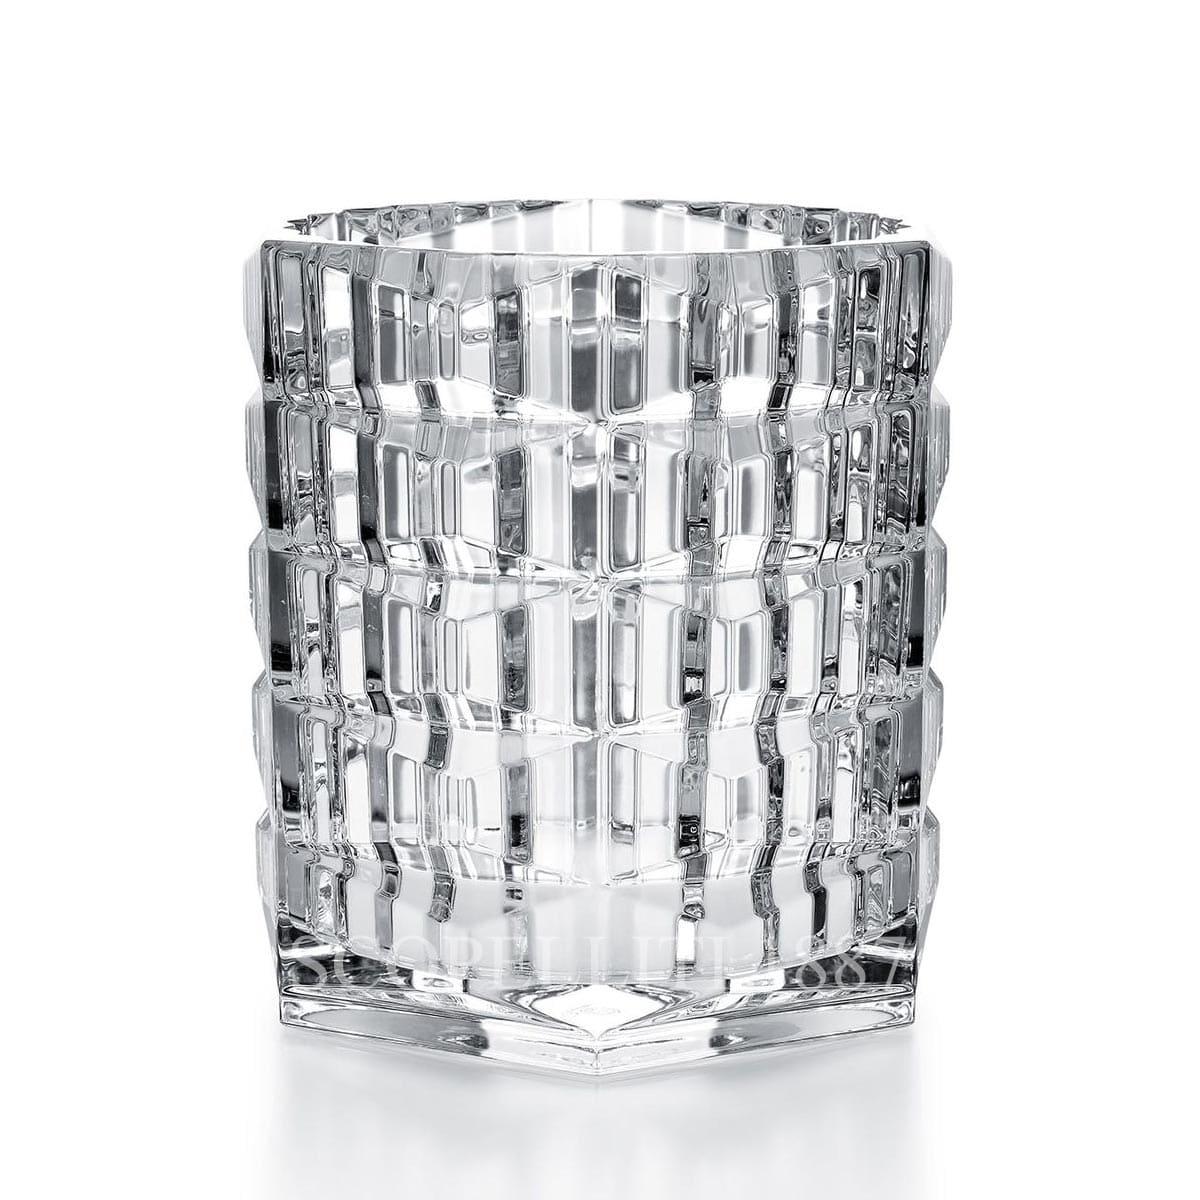 baccarat crystal french design louxor grand vase